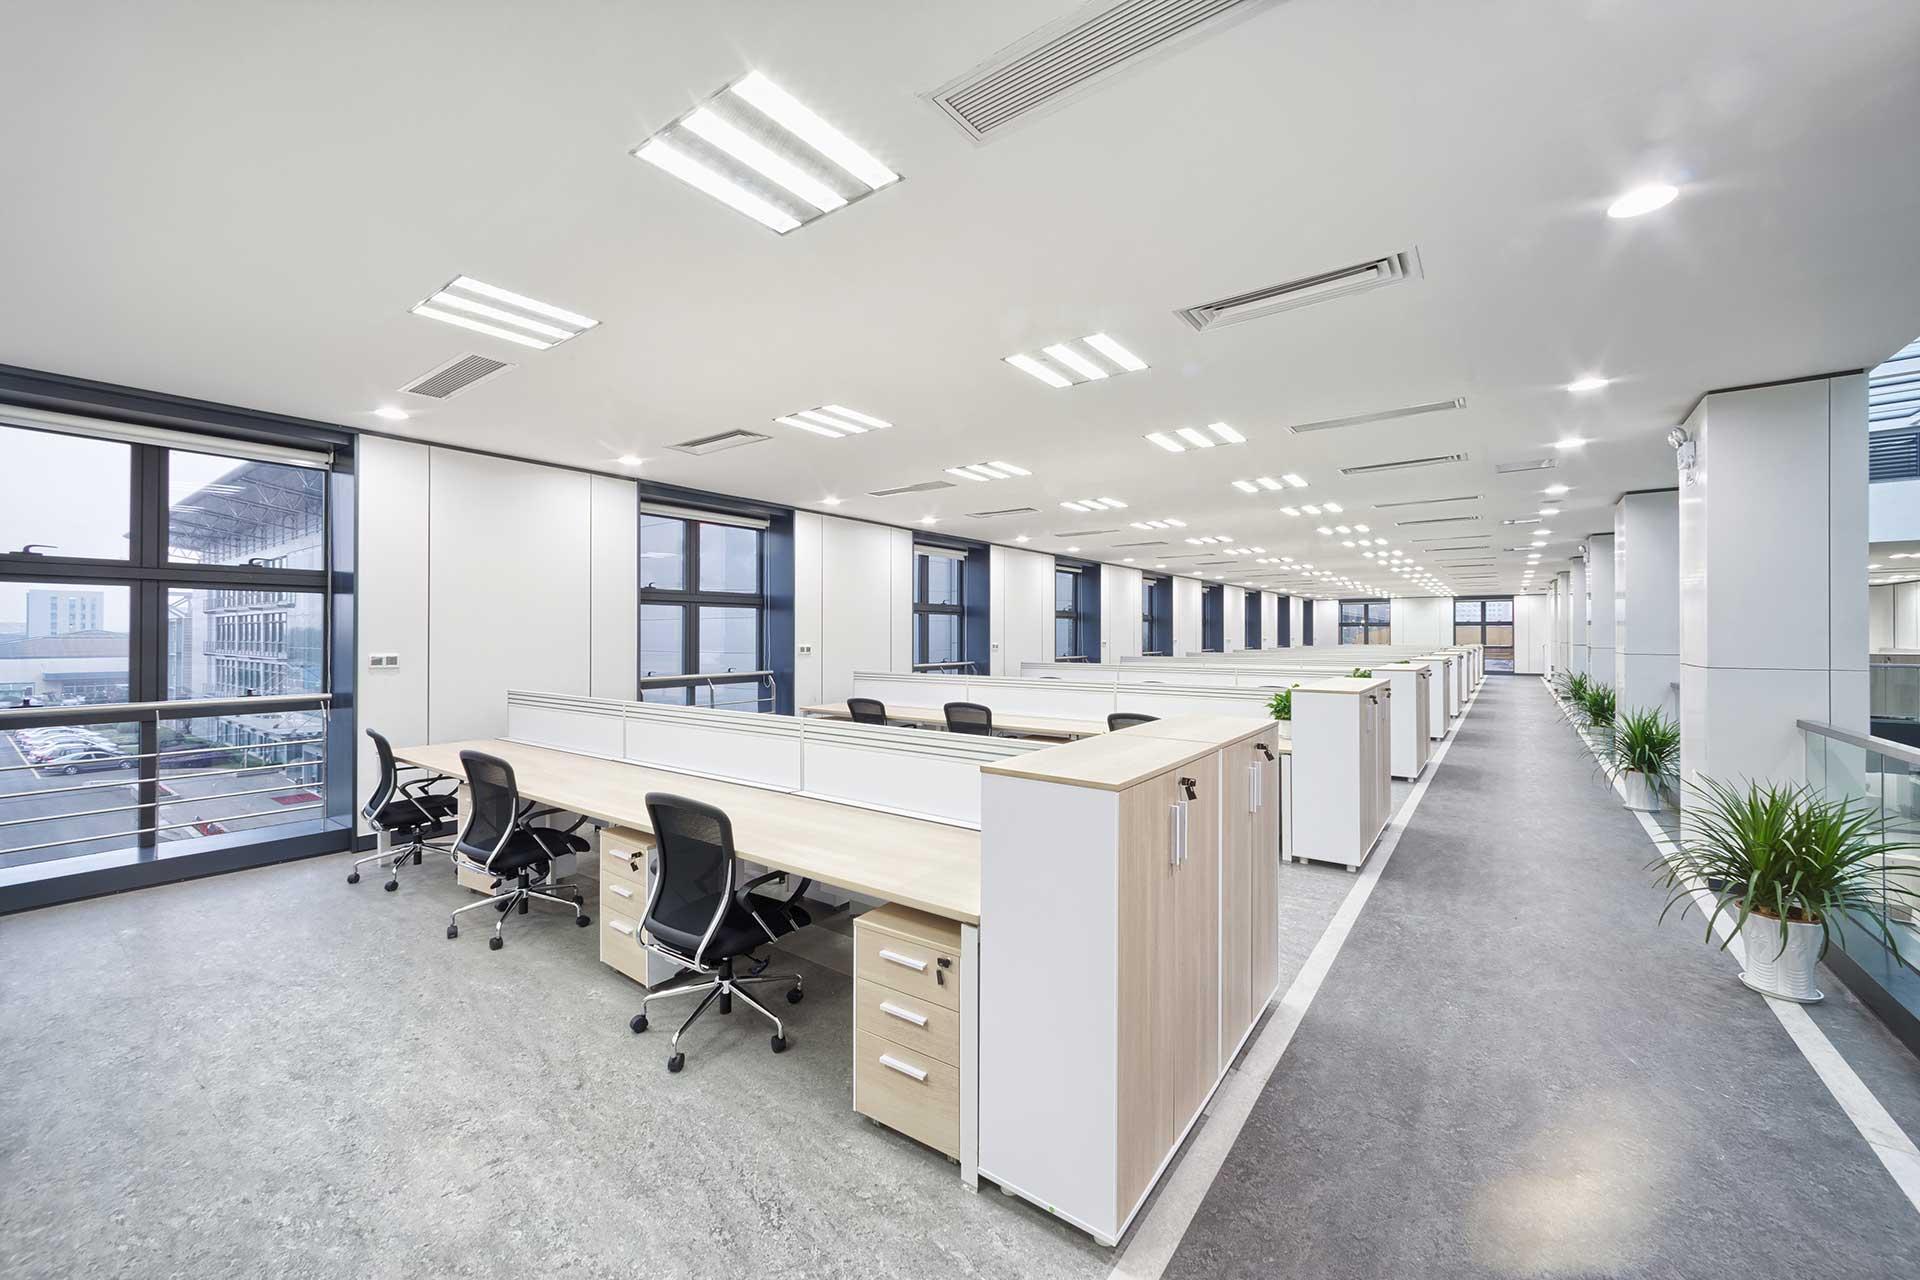 Office led lighting efficient office ceiling lights kellwood